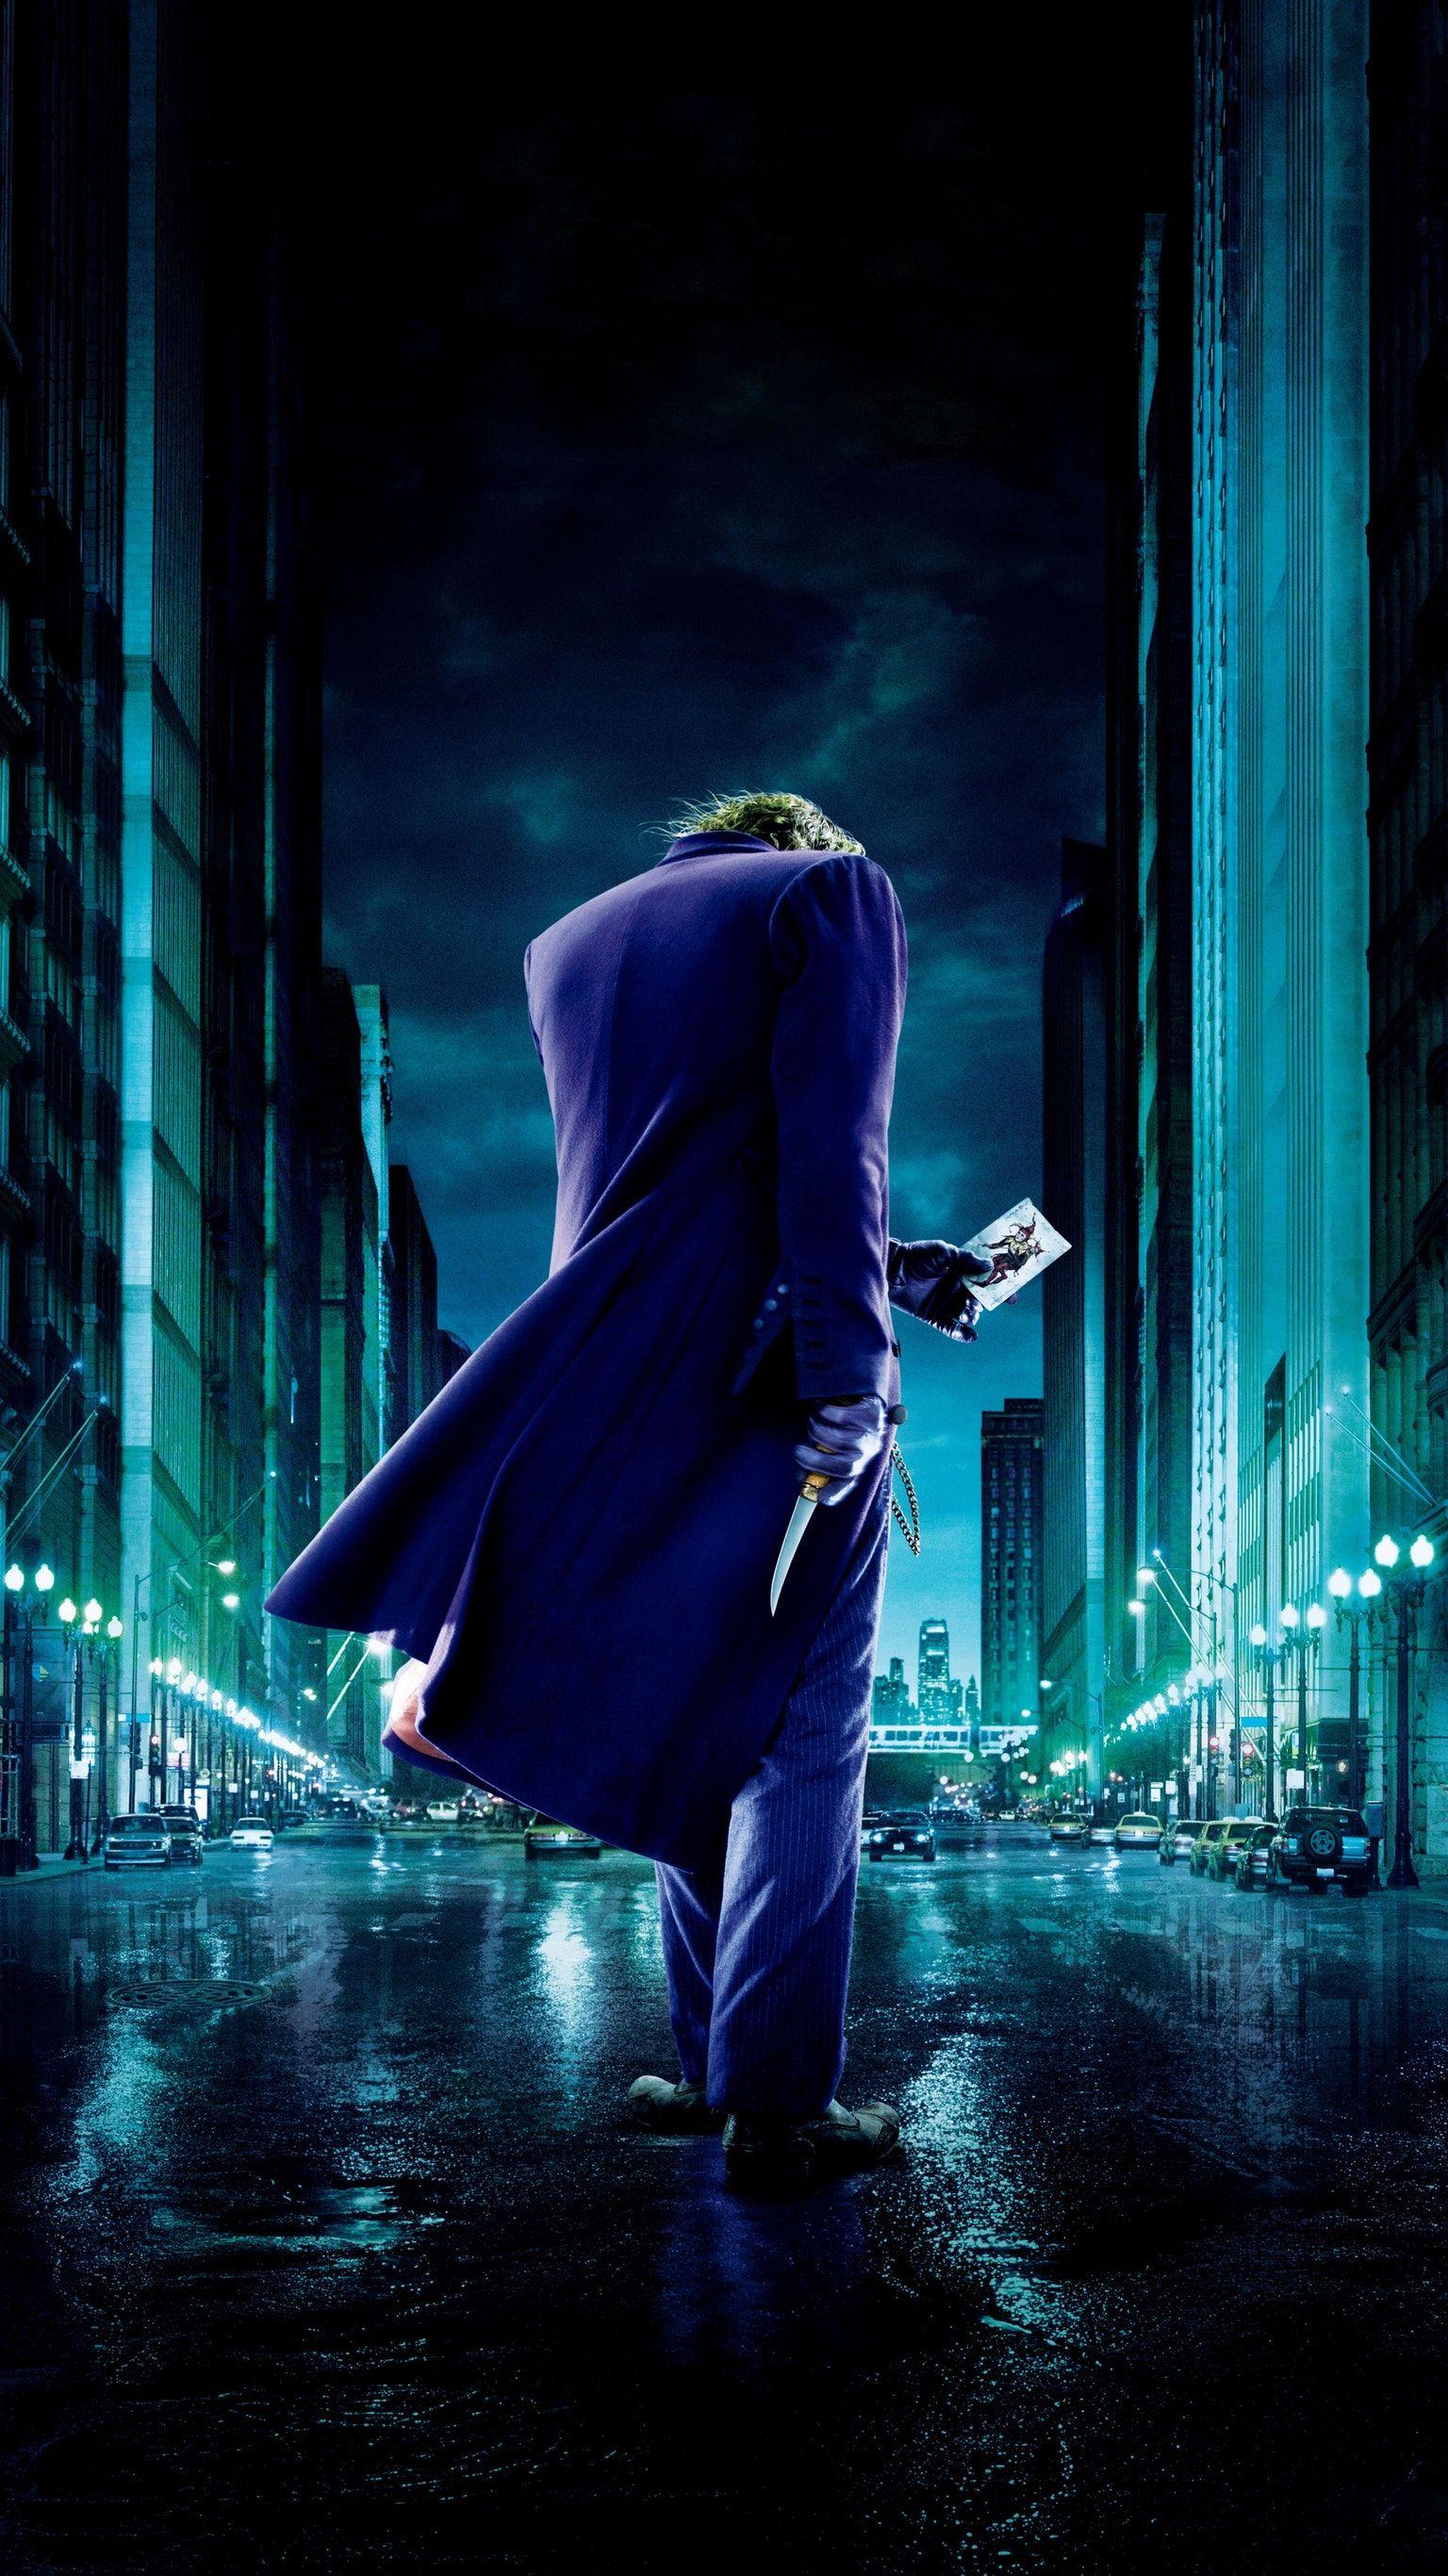 The Dark Knight 2008 Phone Wallpaper Moviemania Batman Joker Wallpaper Joker Wallpapers Joker Images